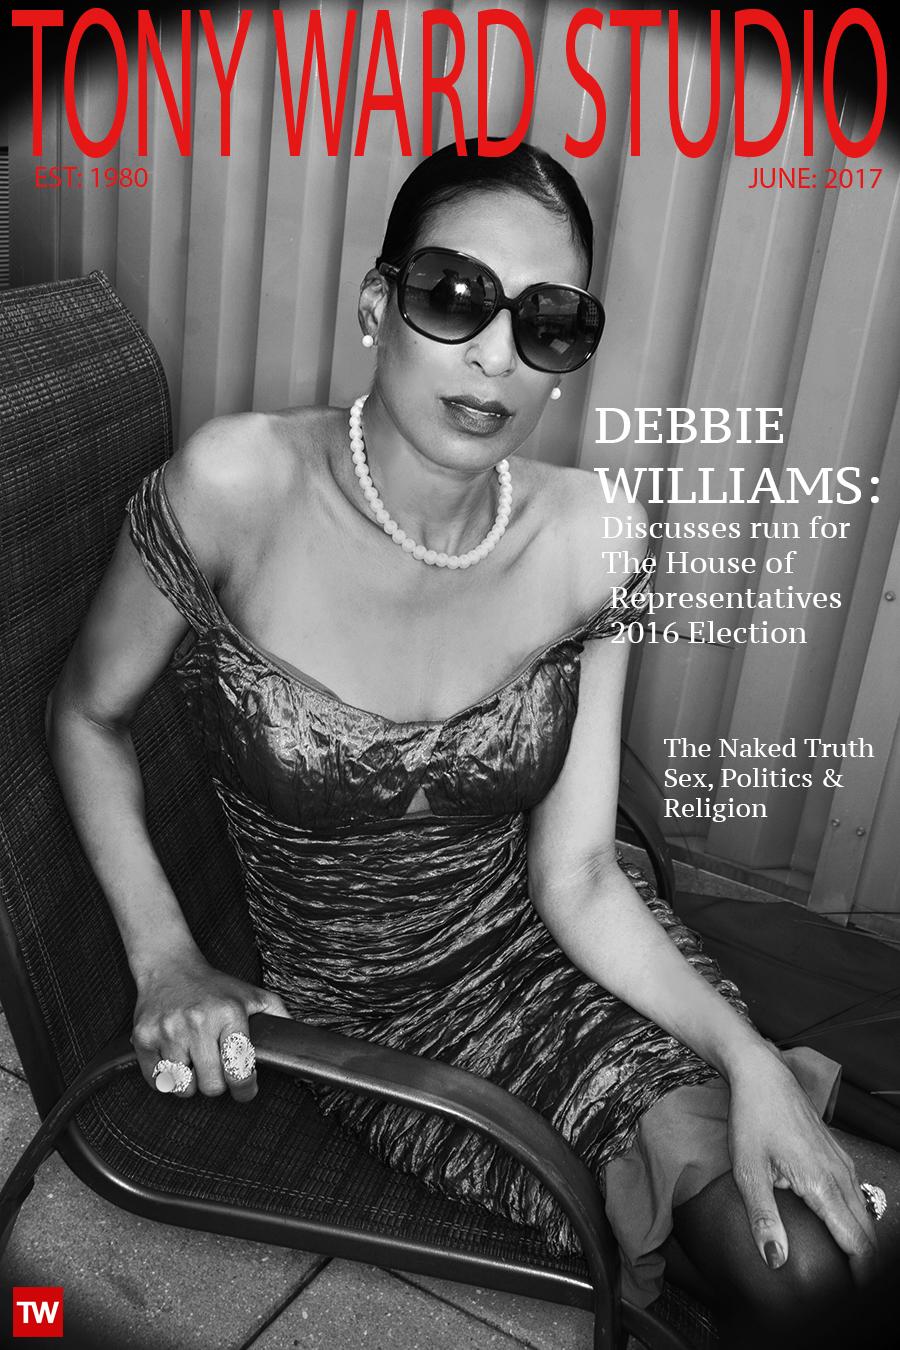 Tony_Ward_Studio_Cover_June_2017_Debbie_Williams_politics_sex_religion_naked